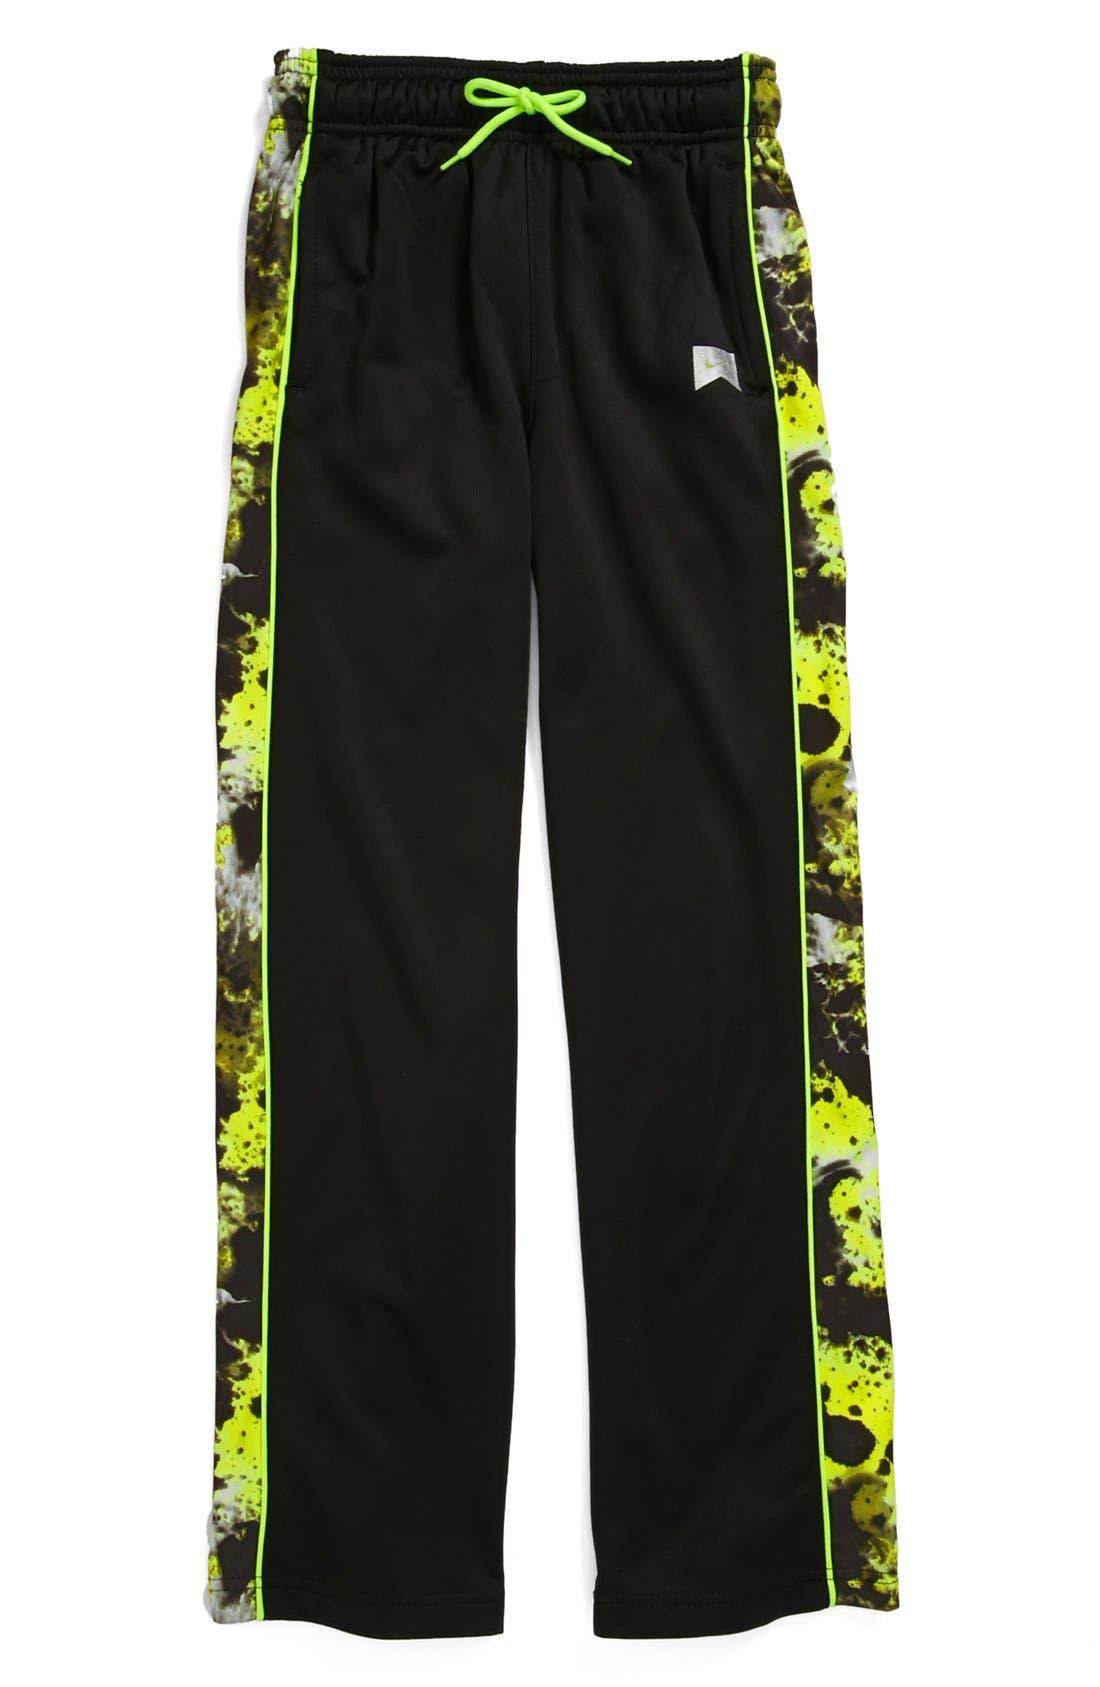 Main Image - Nike 'Therma-FIT' Pants (Big Boys)